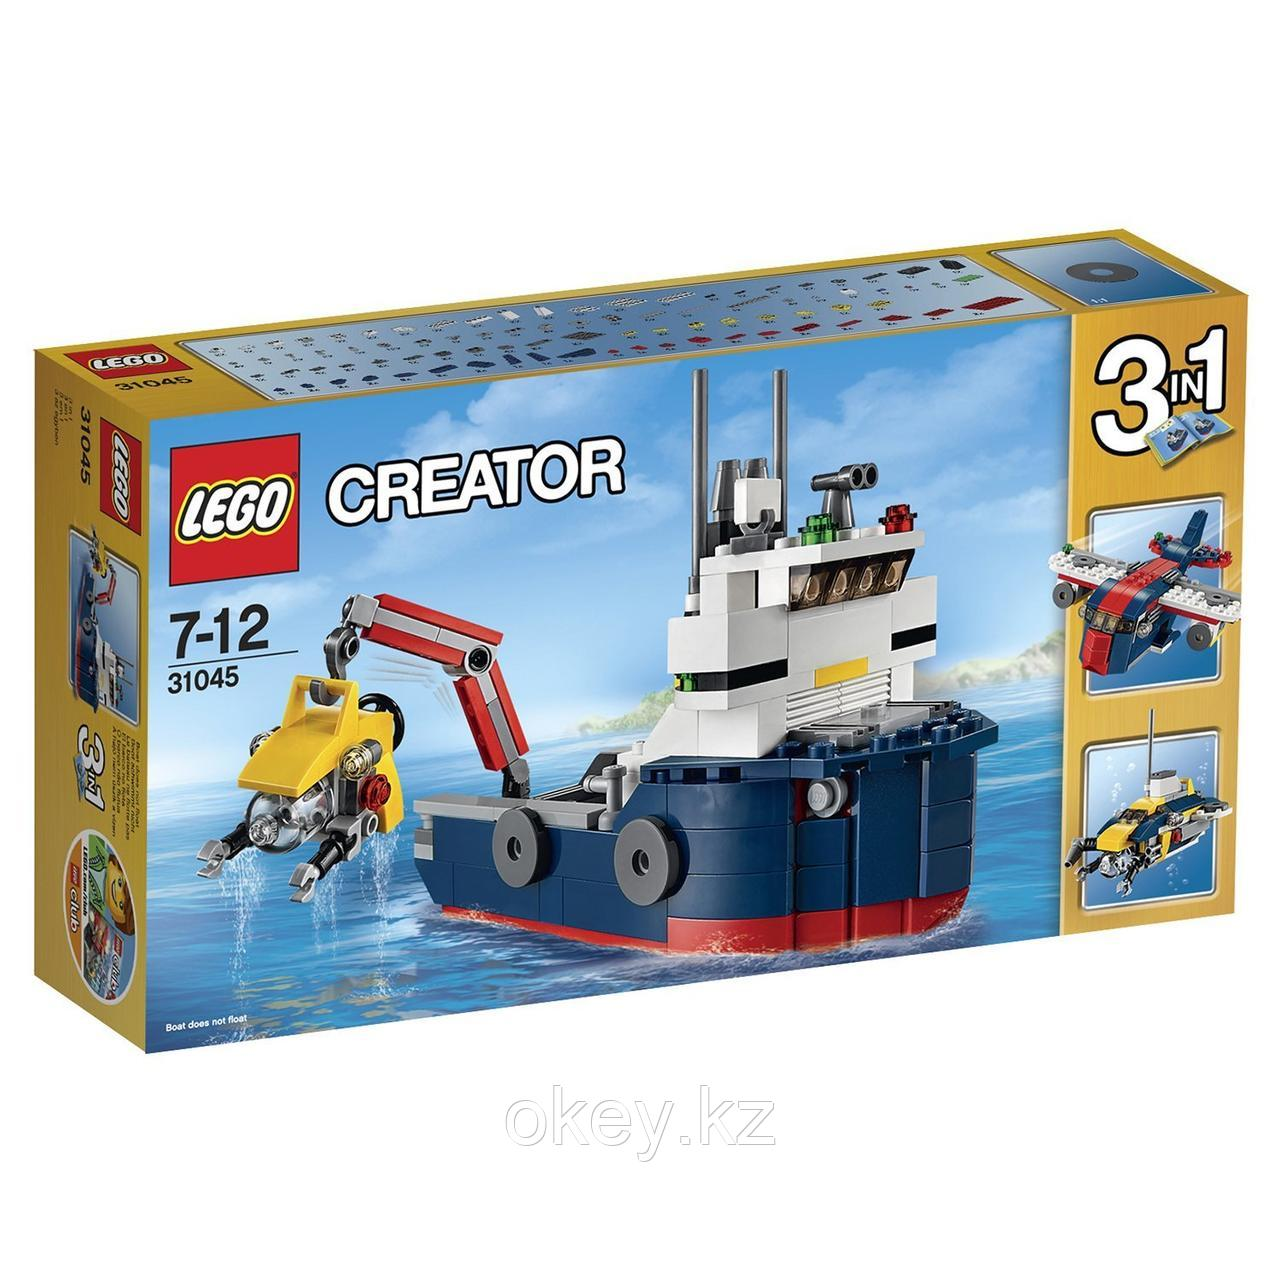 LEGO Creator: Морская экспедиция 31045